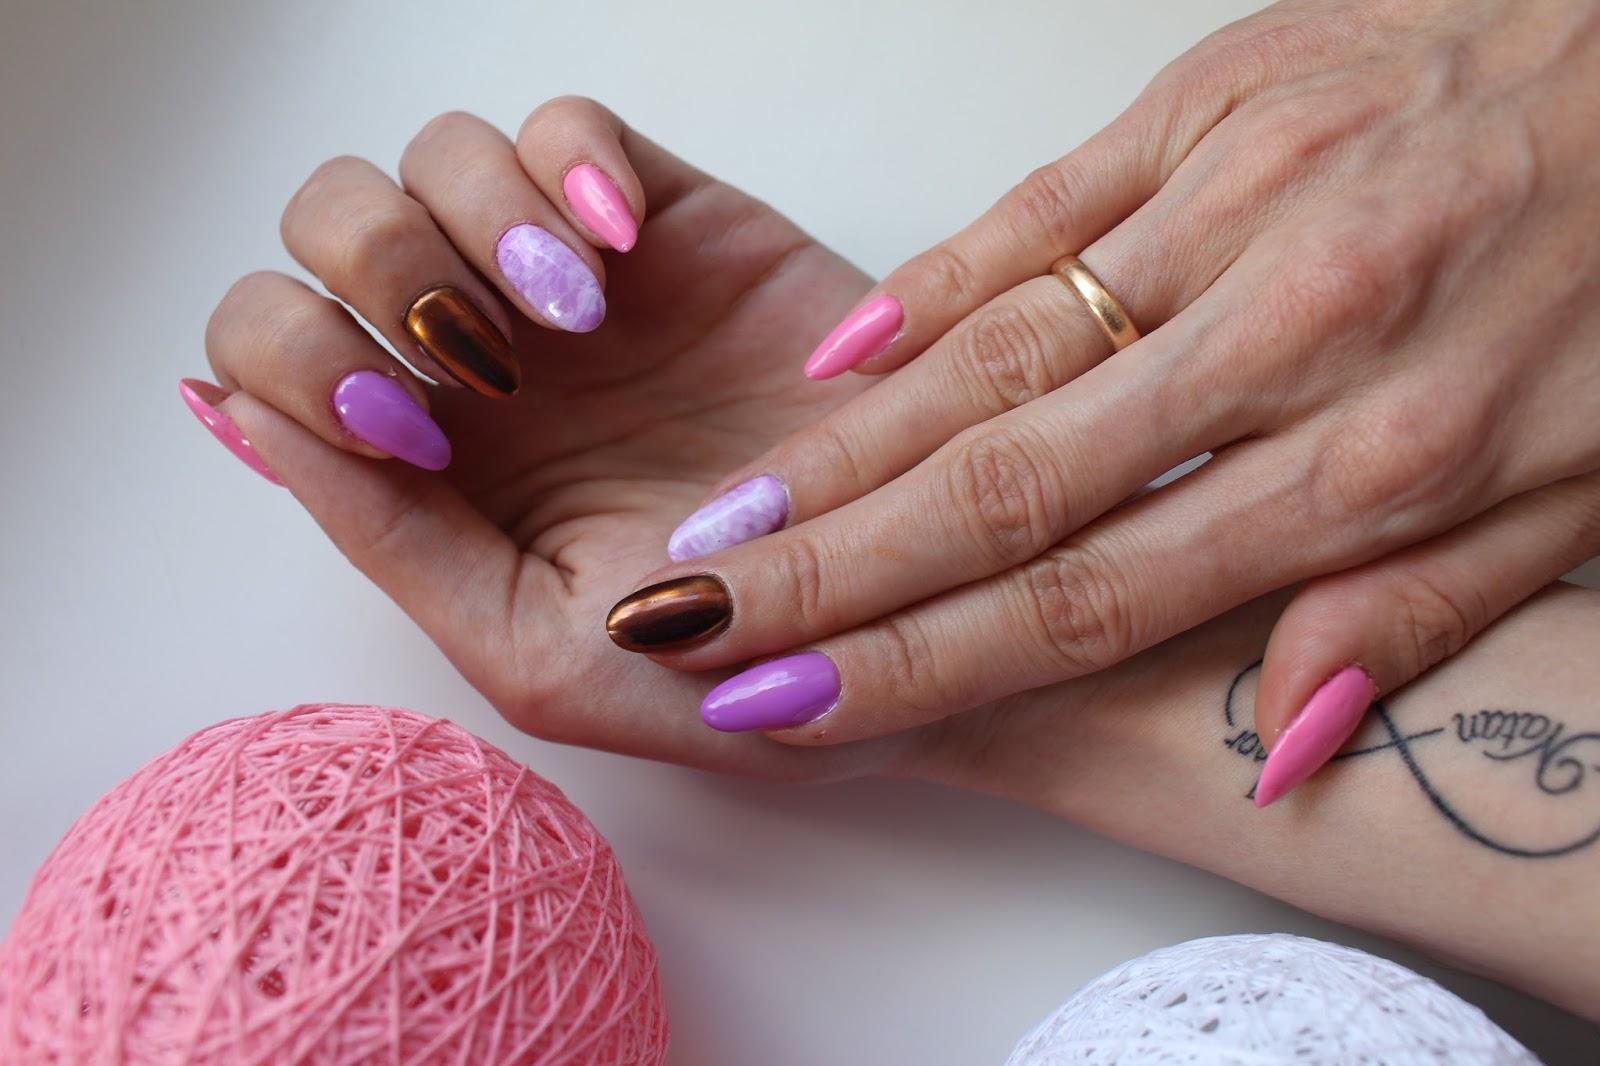 Manicure Hybrydowy Efekt Kameleona Cosmetics At Hand